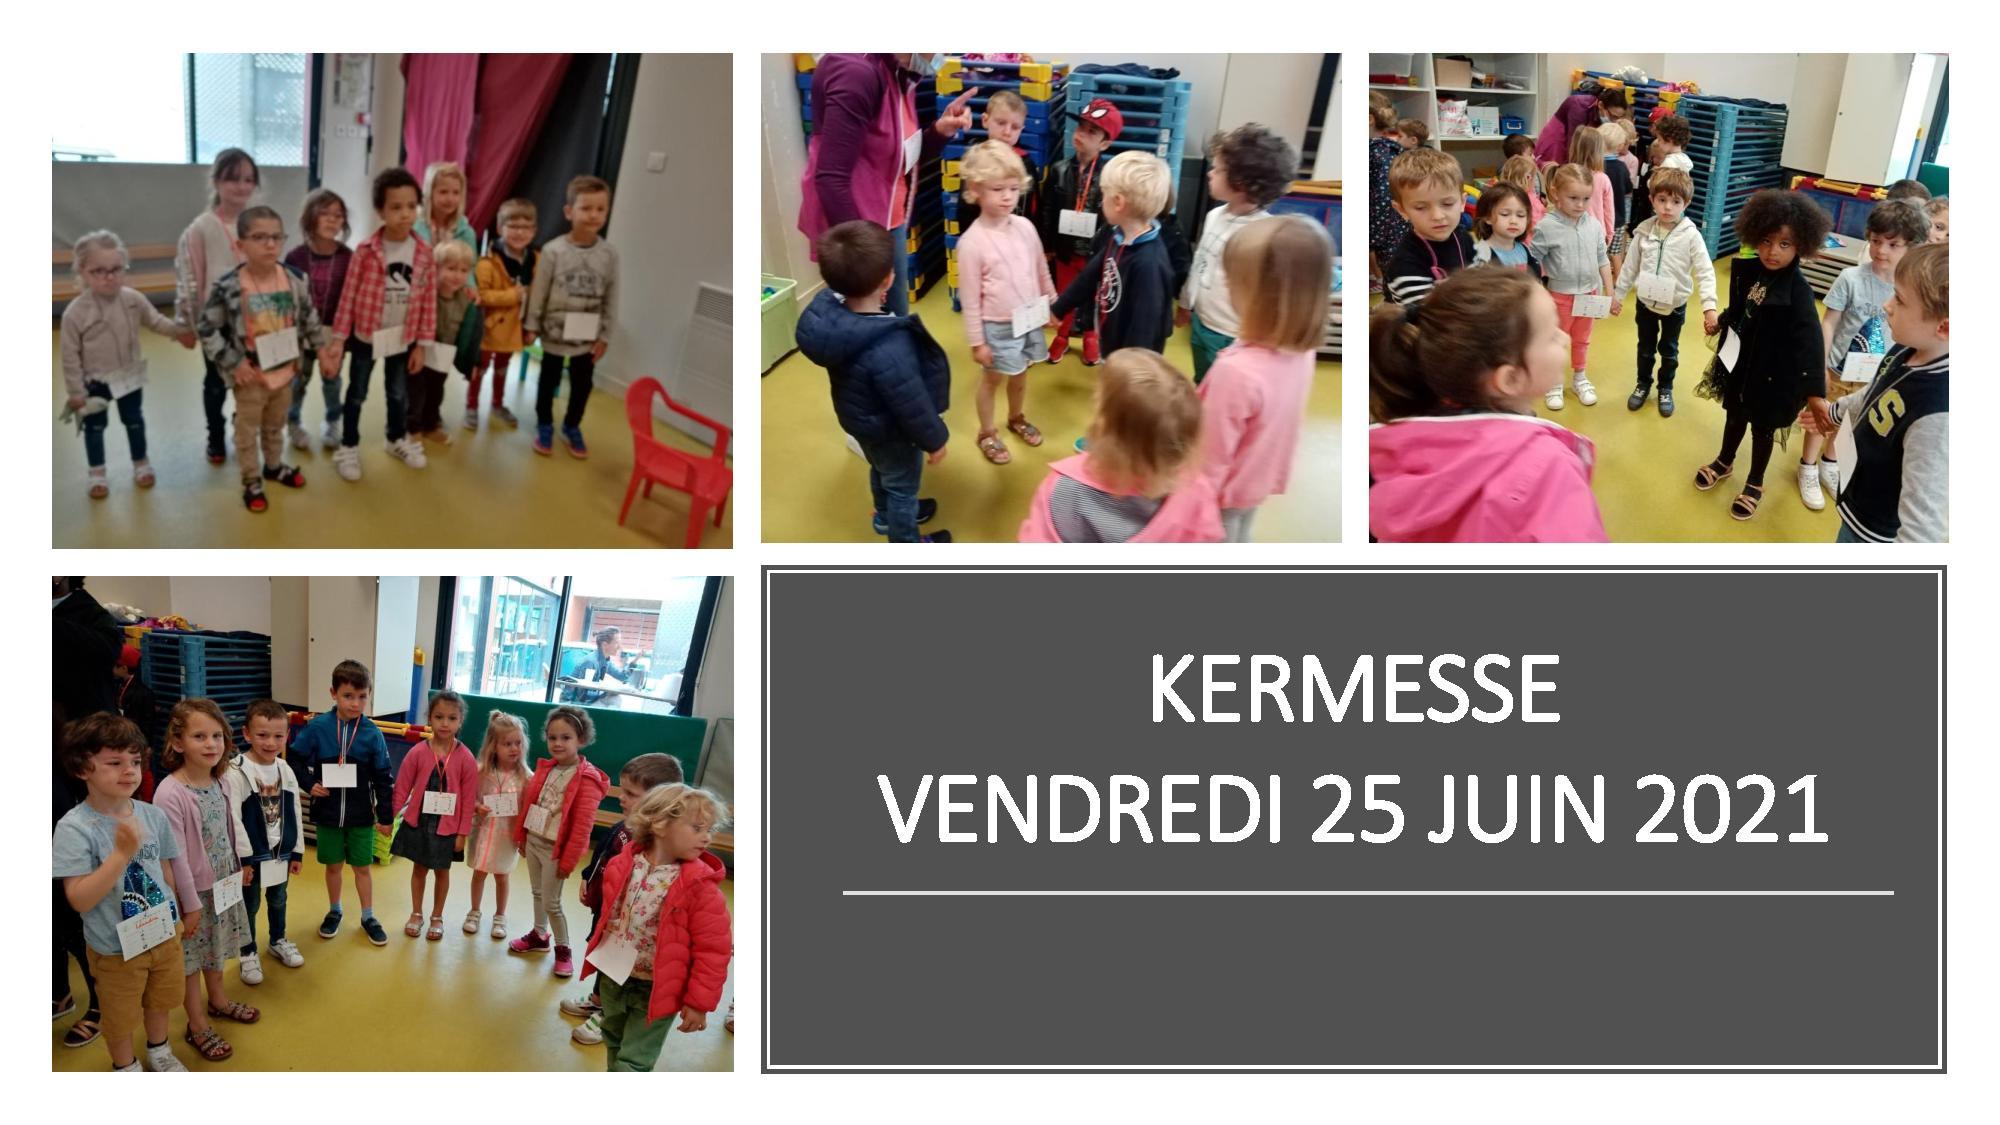 KERMESSE-page-001